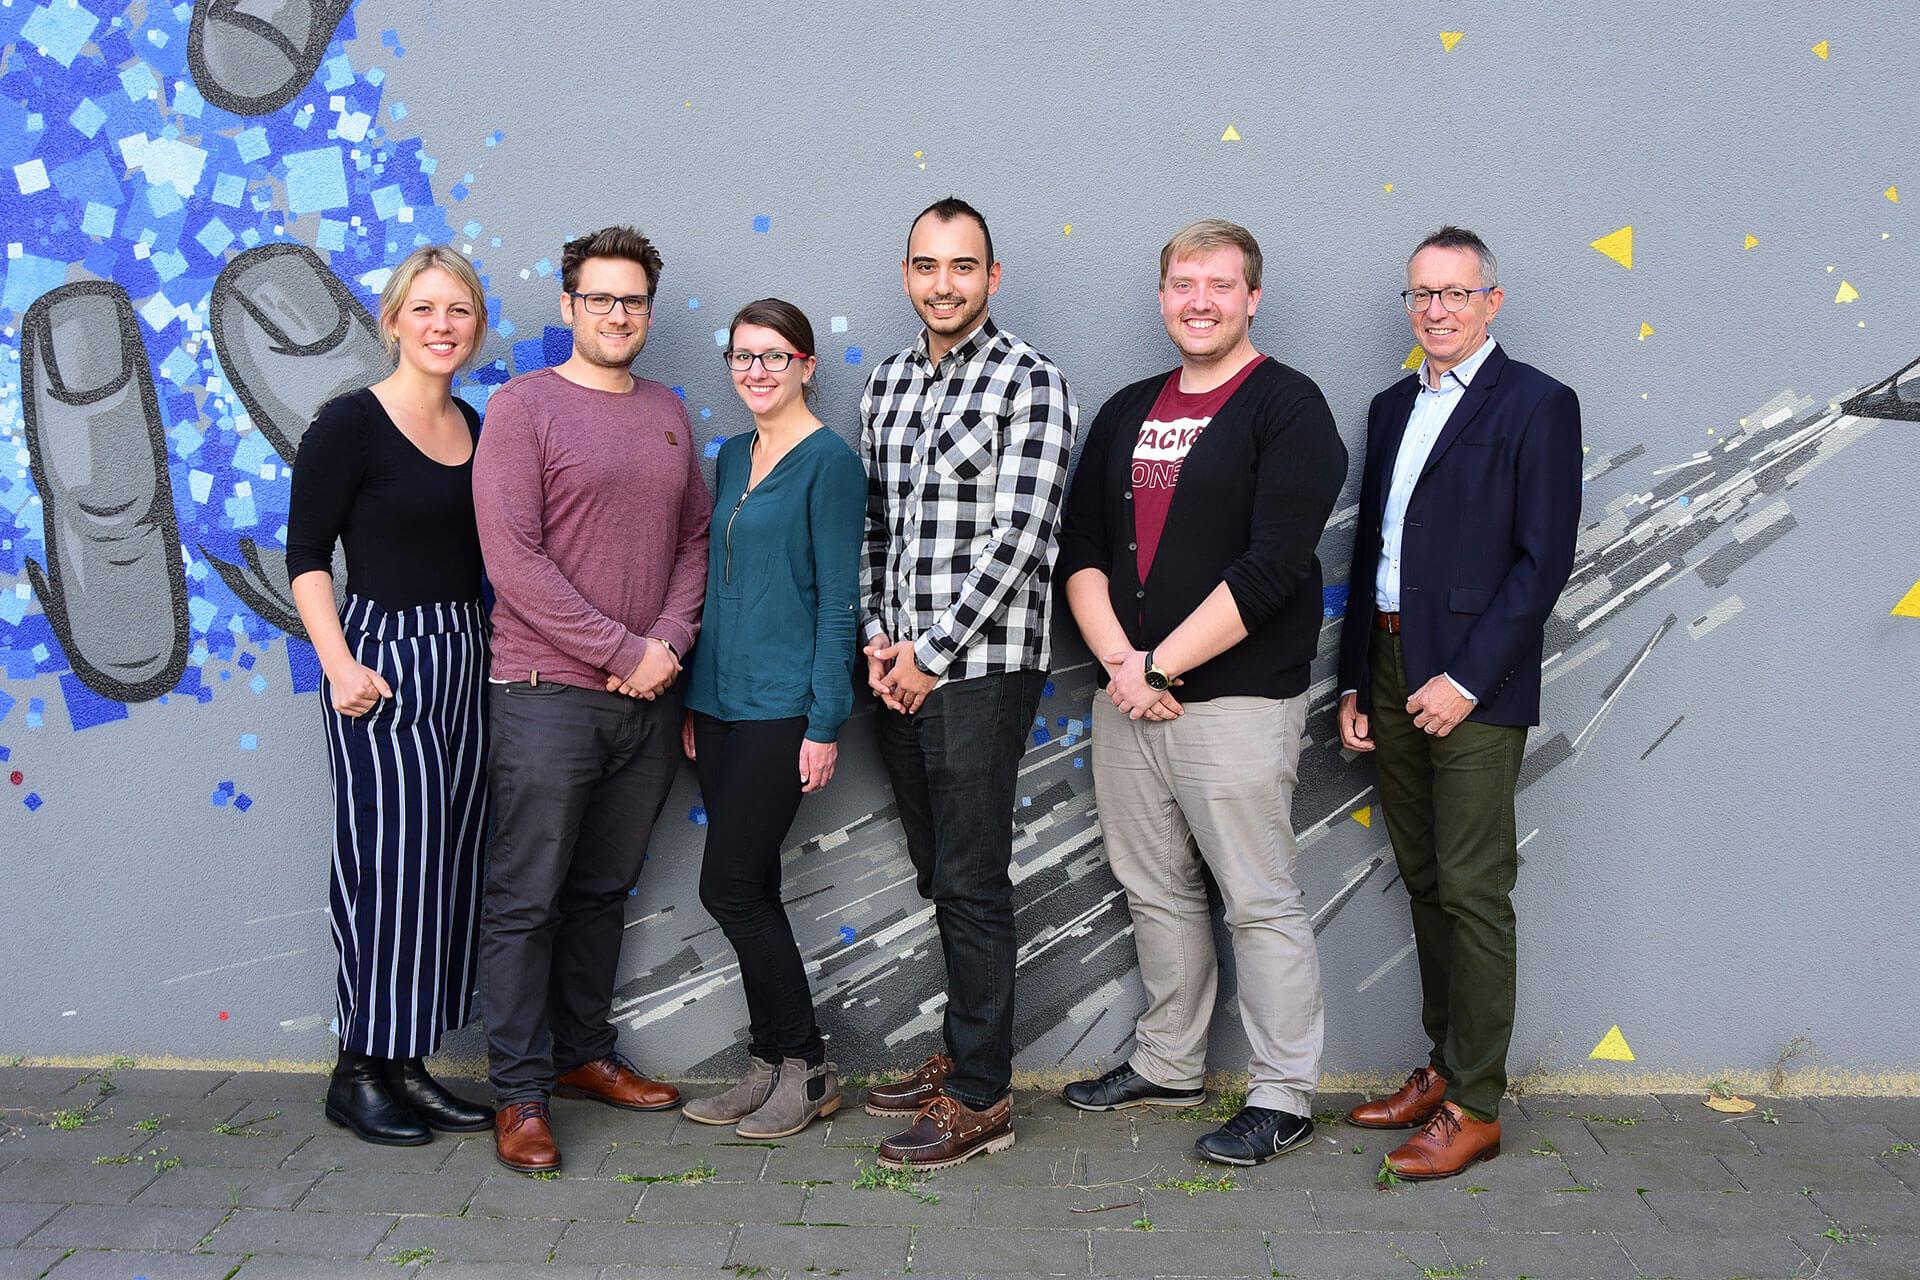 schulportrait-seminarschule-content-mathematik-18-19 -1